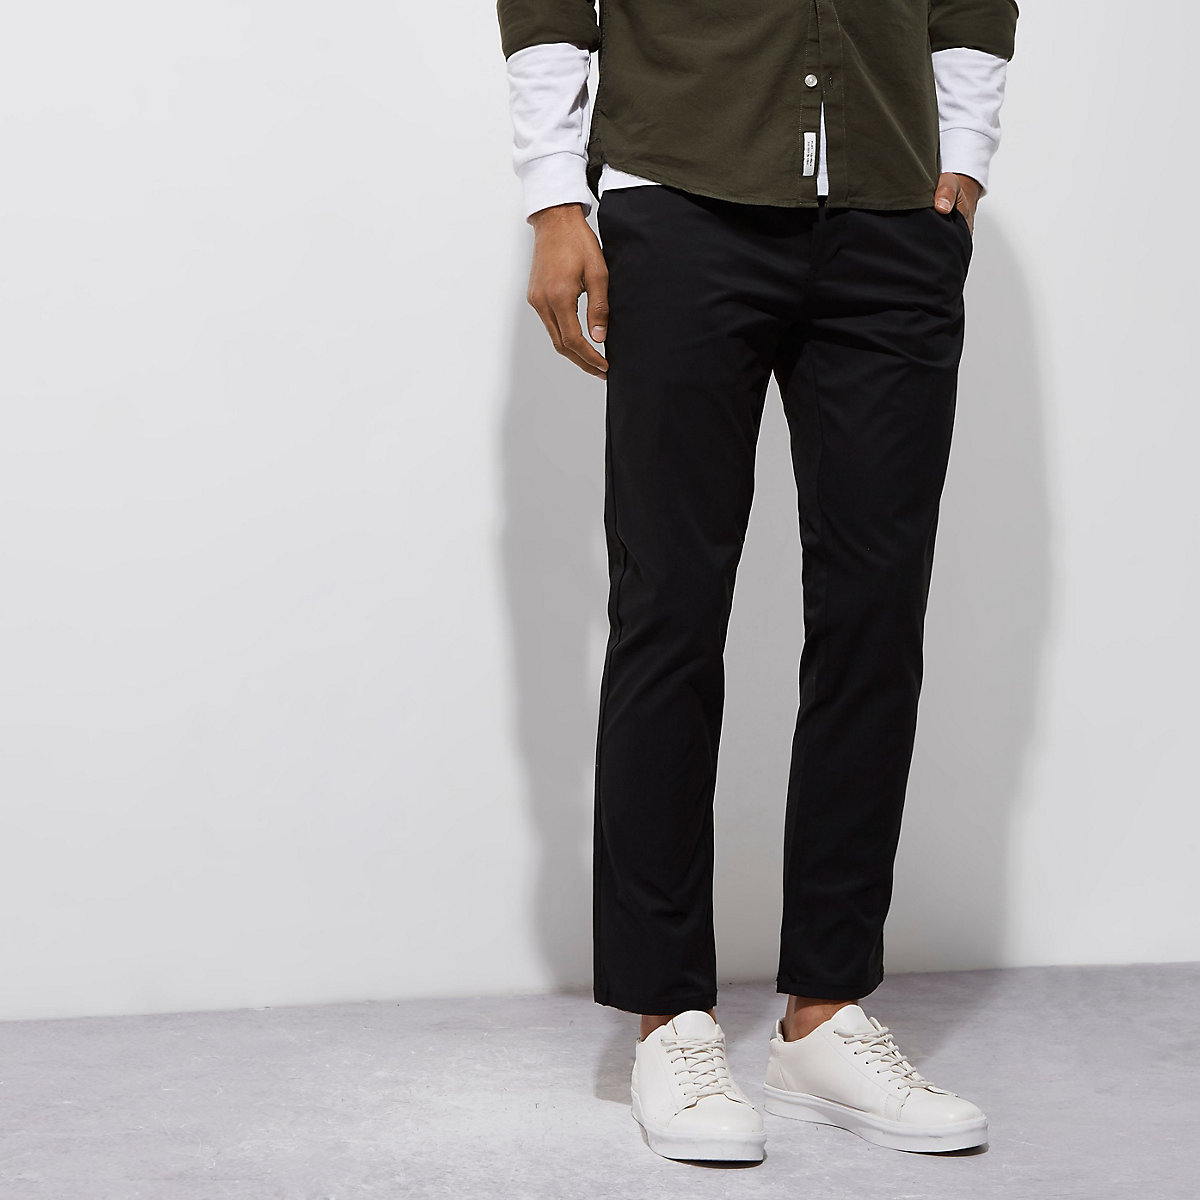 Black stretch slim chino pants